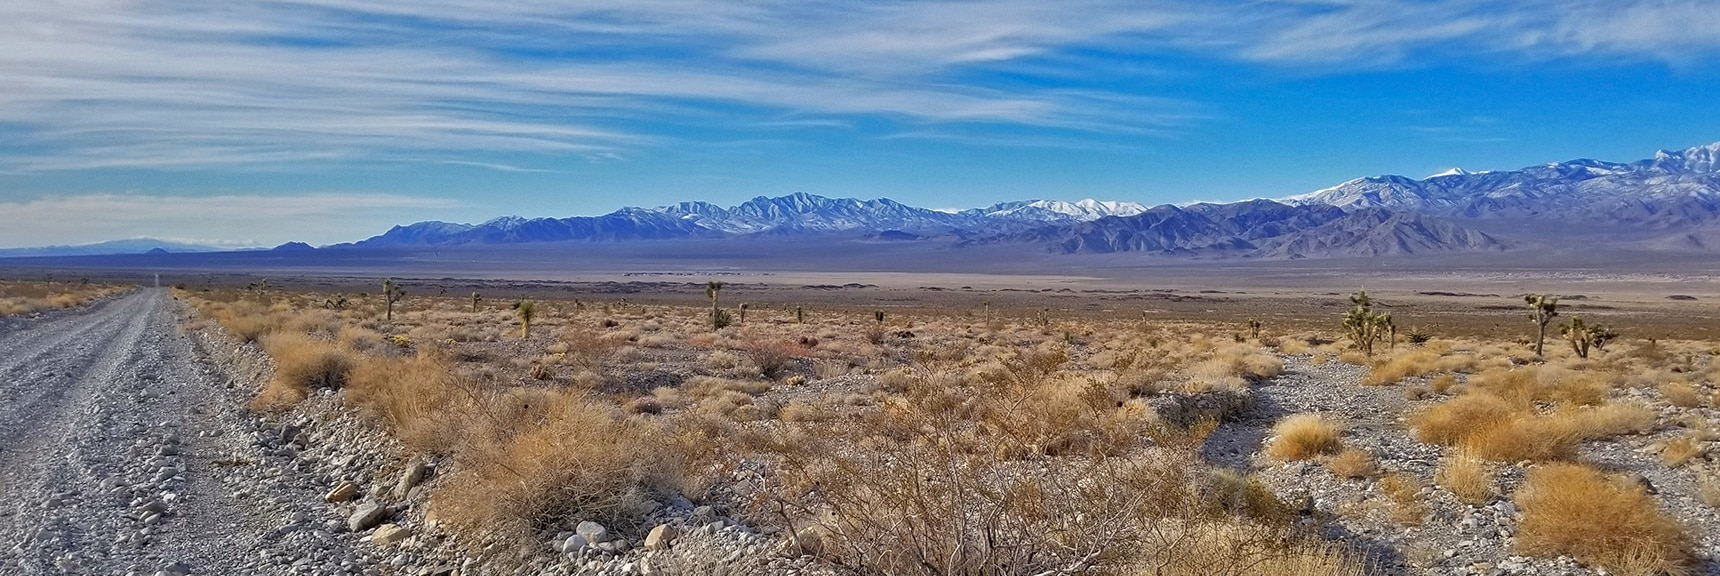 La Madre Mountains Wilderness from Alamo Road   Cow Camp Road   Sheep Range   Desert National Wildlife Refuge, Nevada